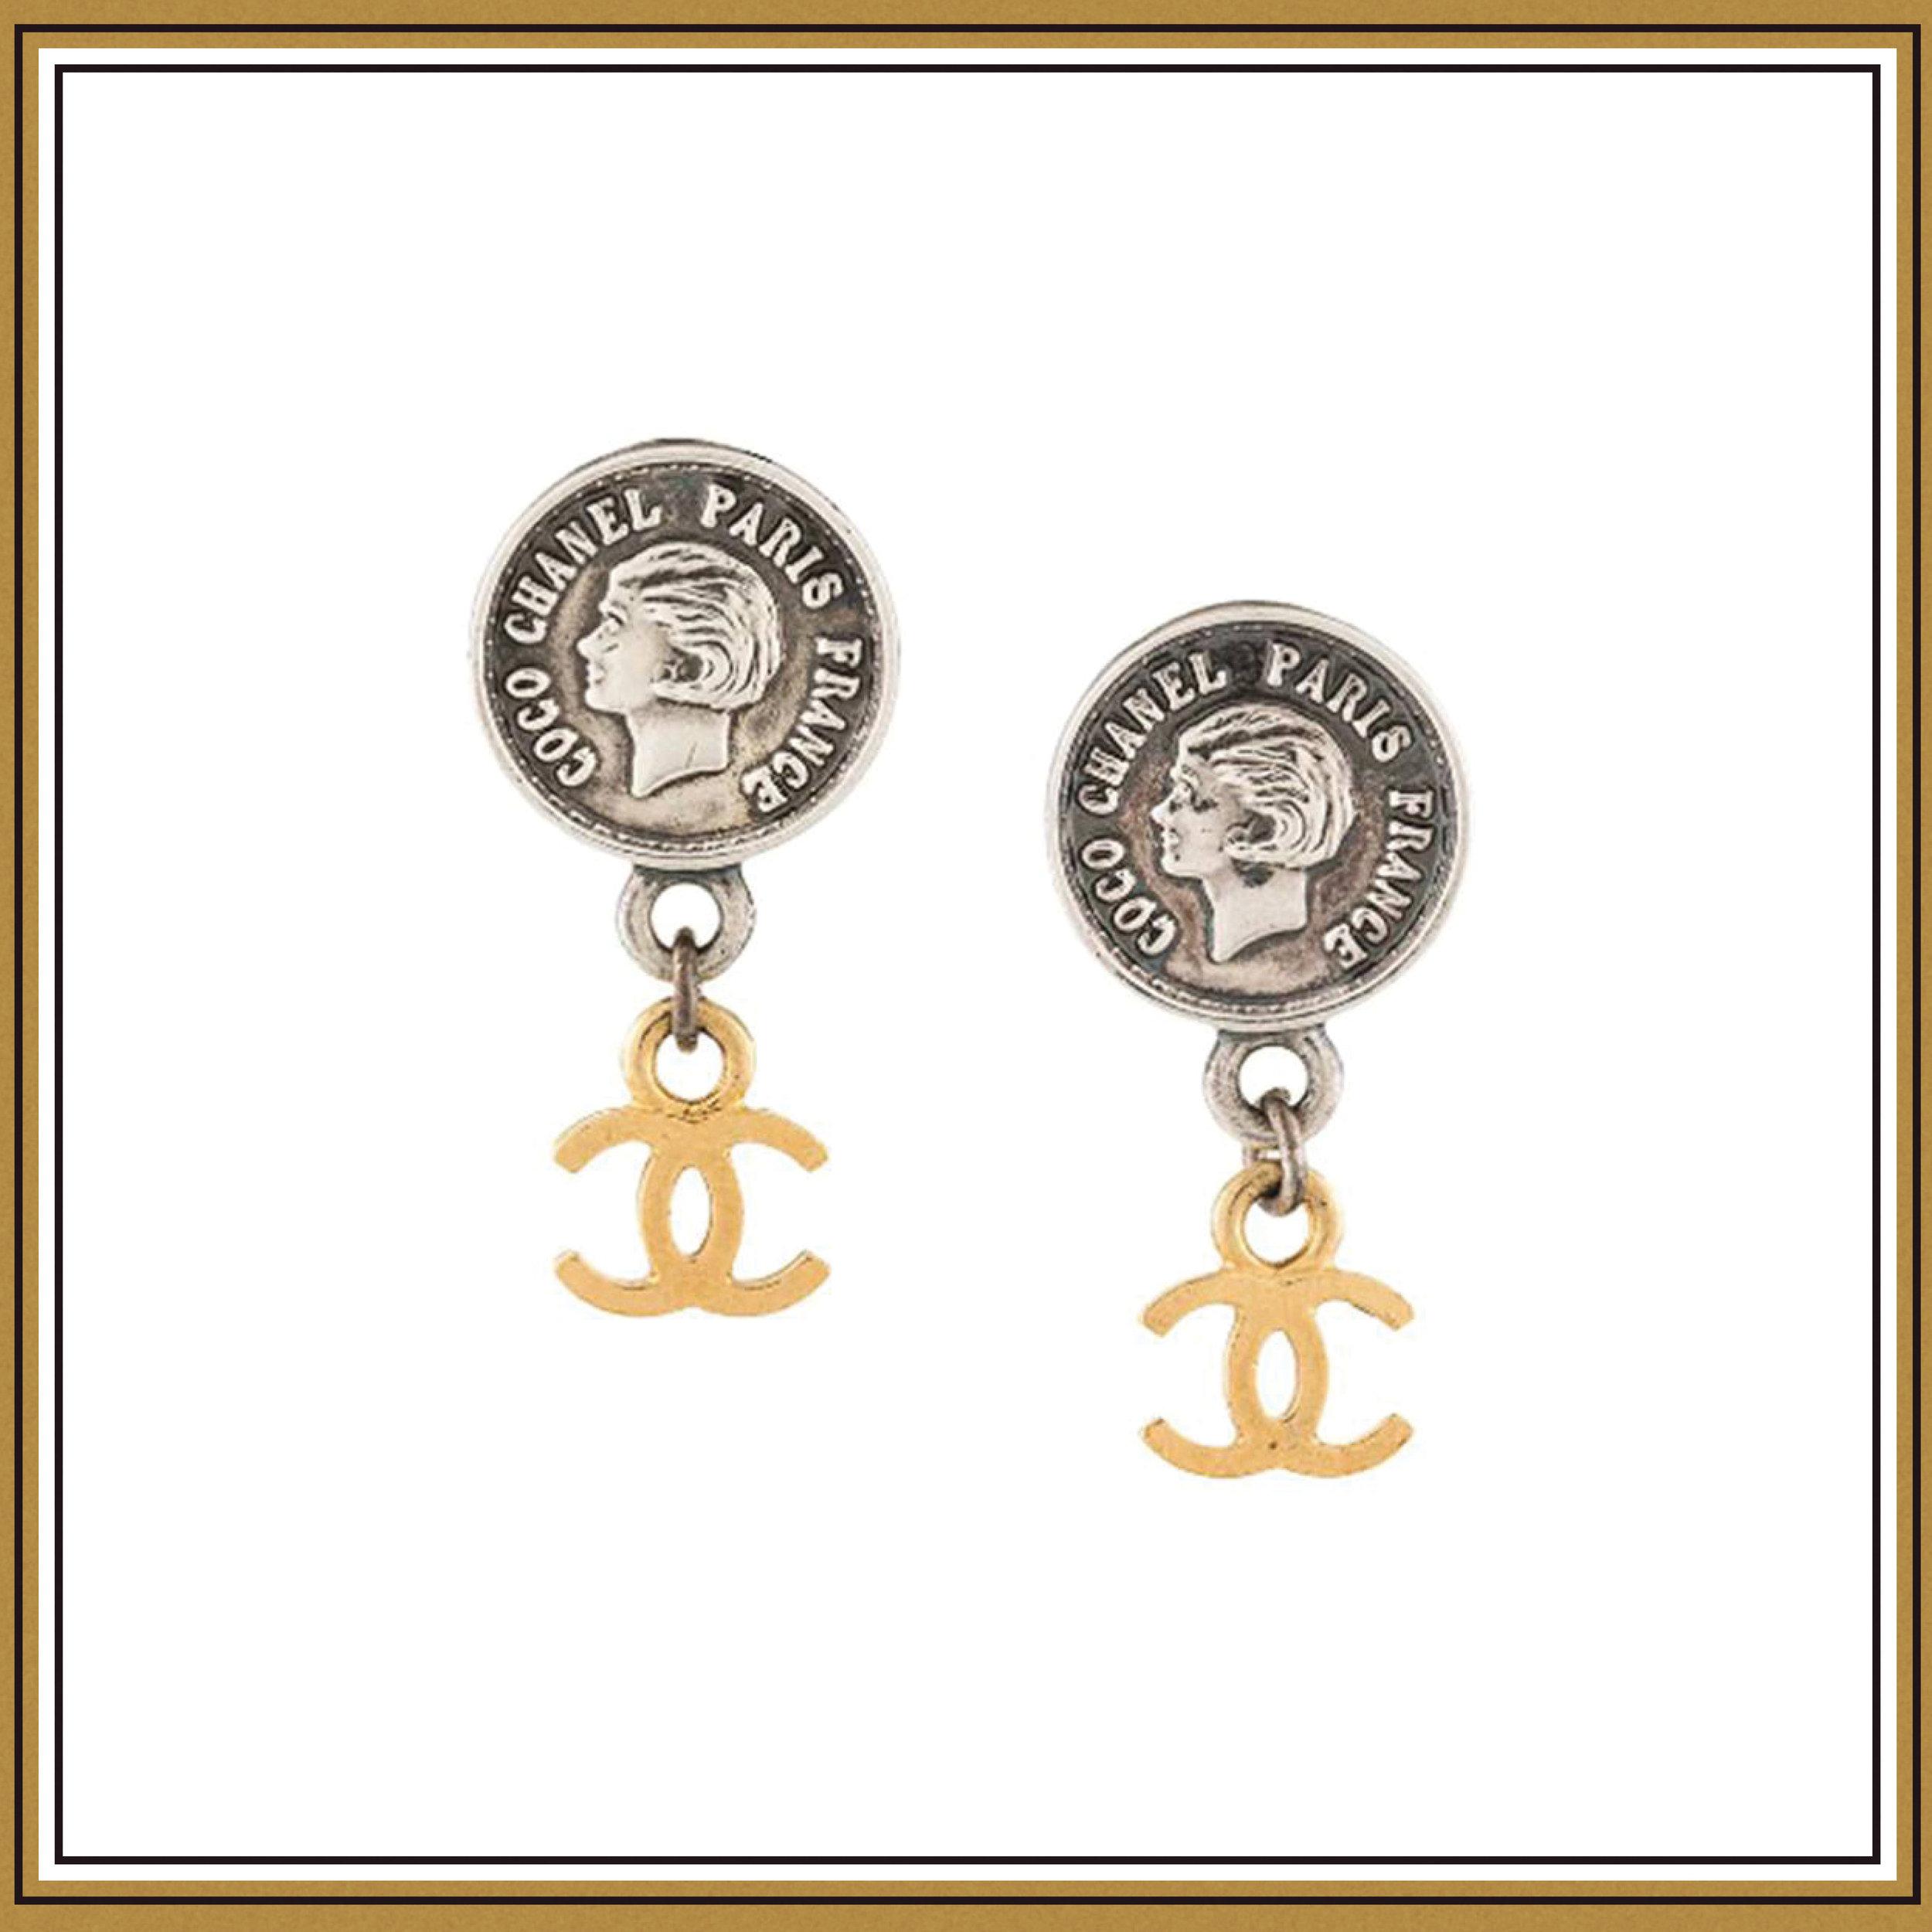 Chanel Vintage CC Earrings ($965)